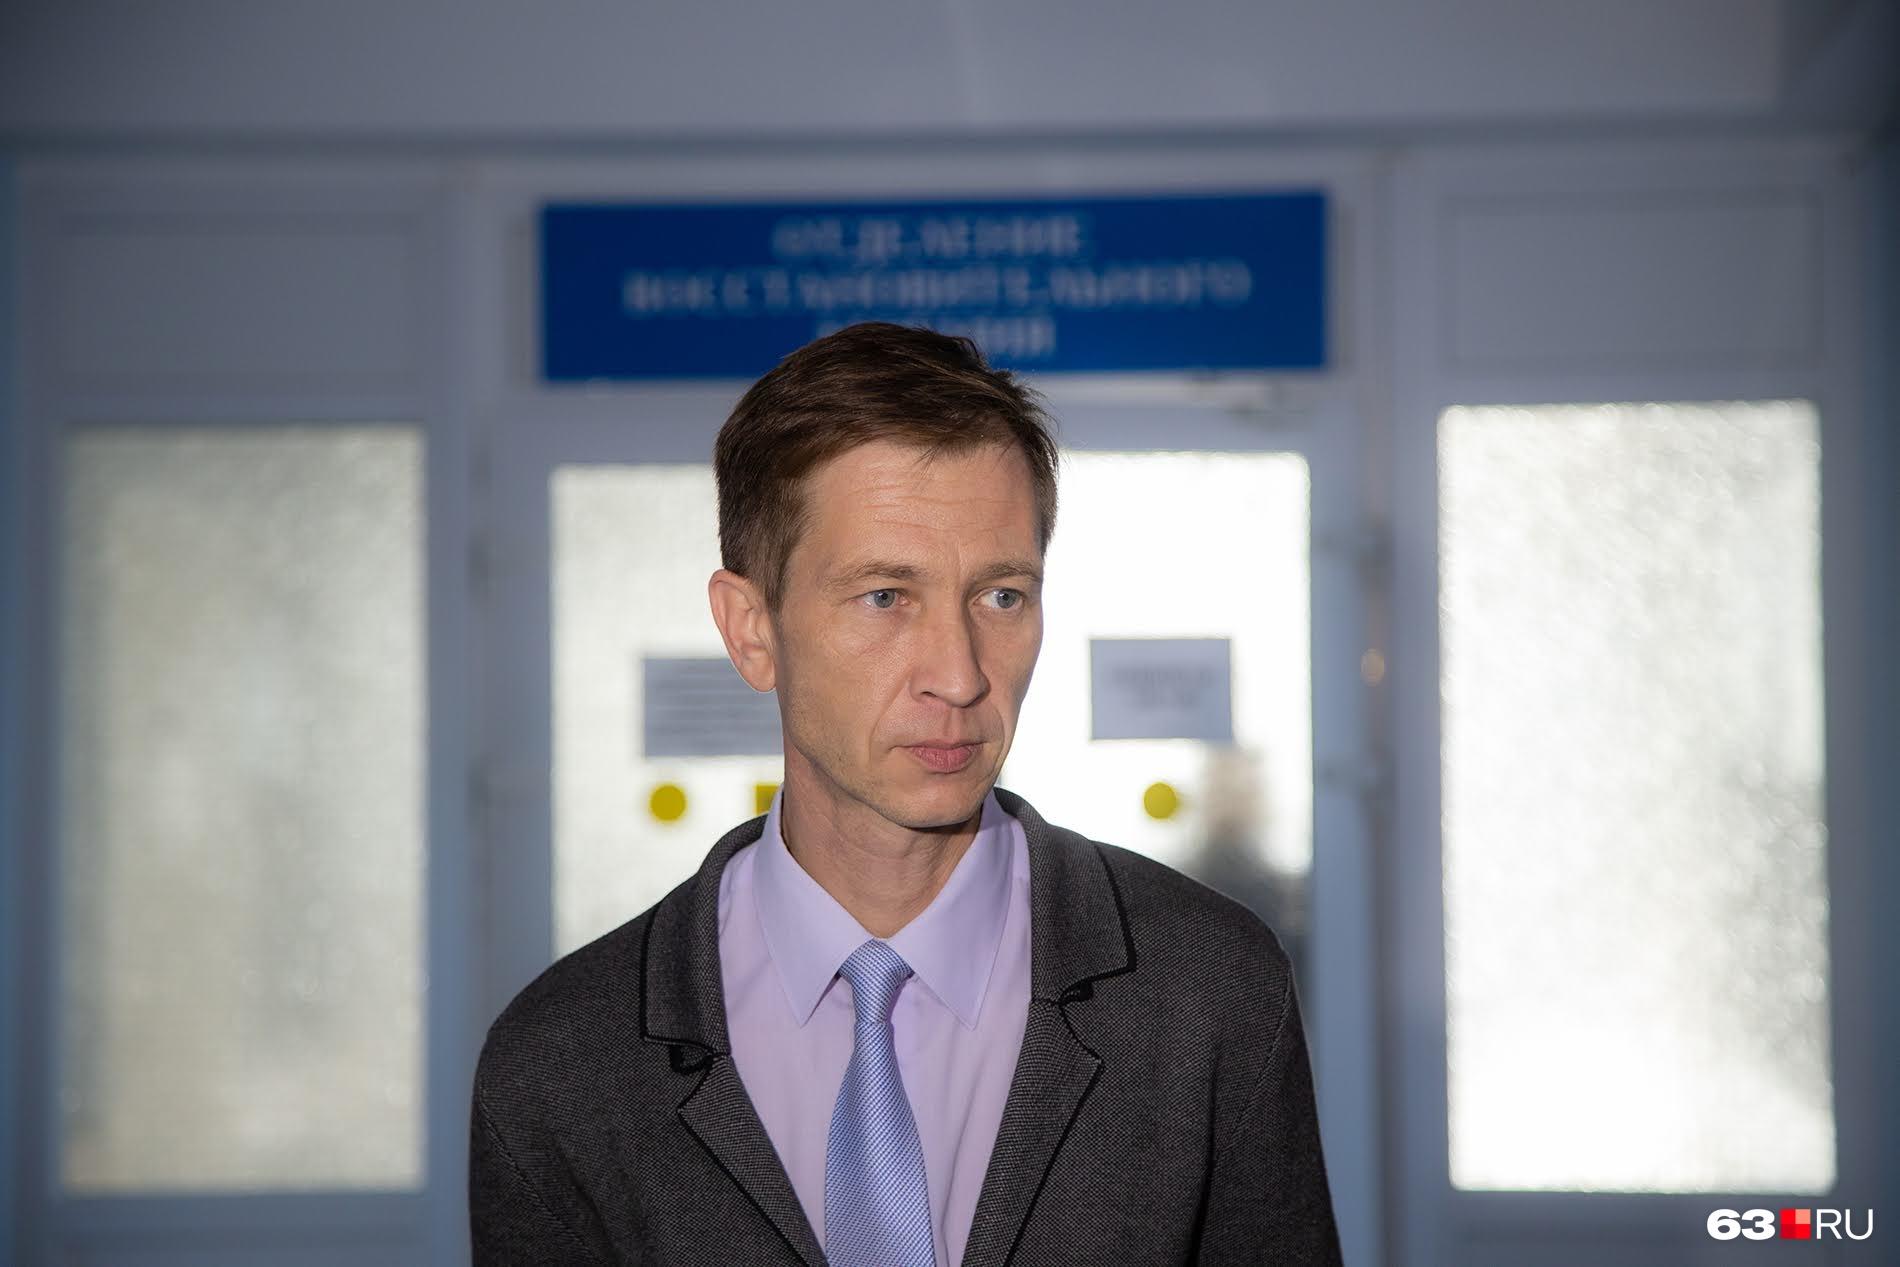 Дмитрий Николаевич Лисица возглавил проект по созданию кол-центра